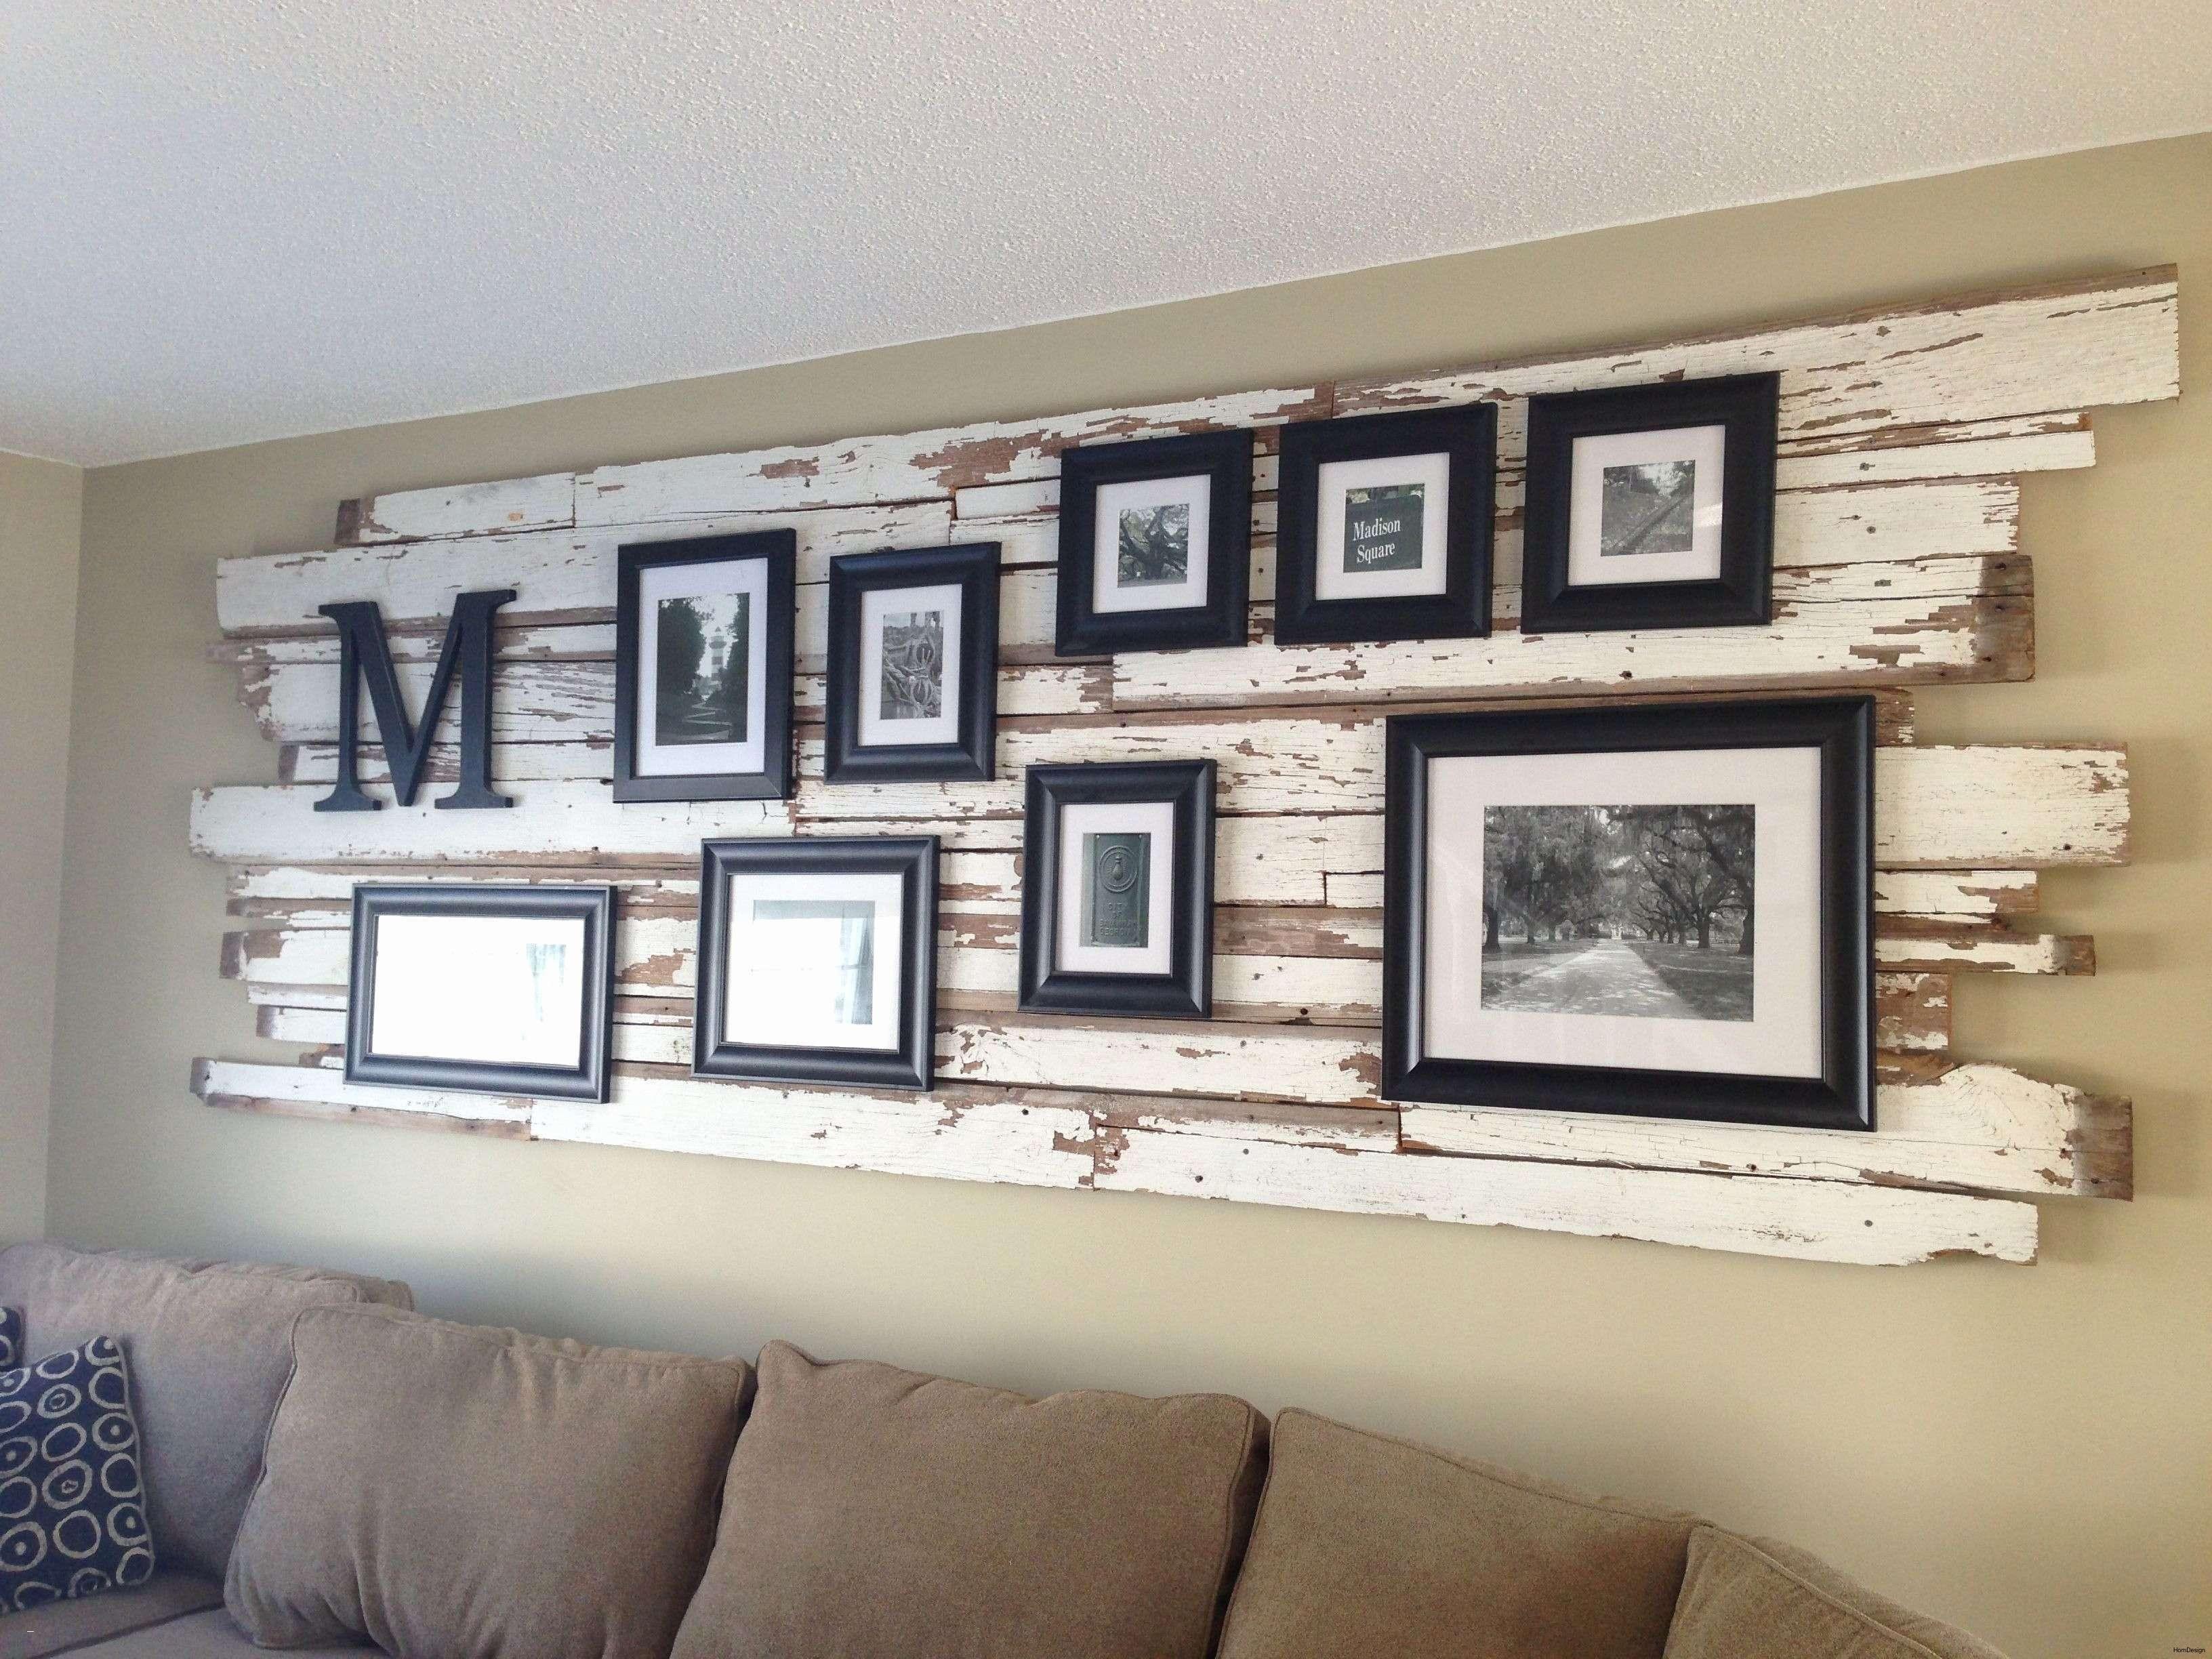 50 Amazing Easy Diy Pallet Art Ideas For Home Decor Decor Home Decor Rustic Wall Decor